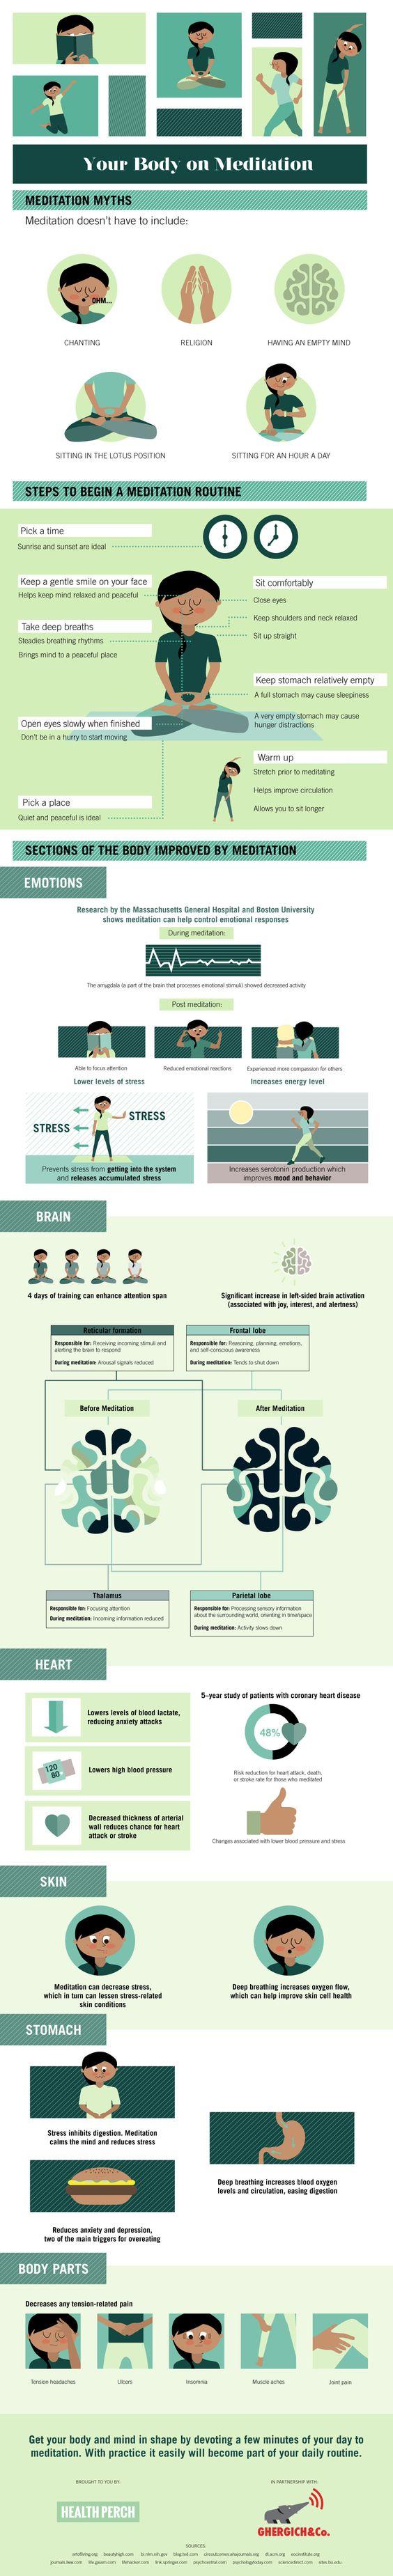 Mindfulness Meditation Blog Infographic.jpg